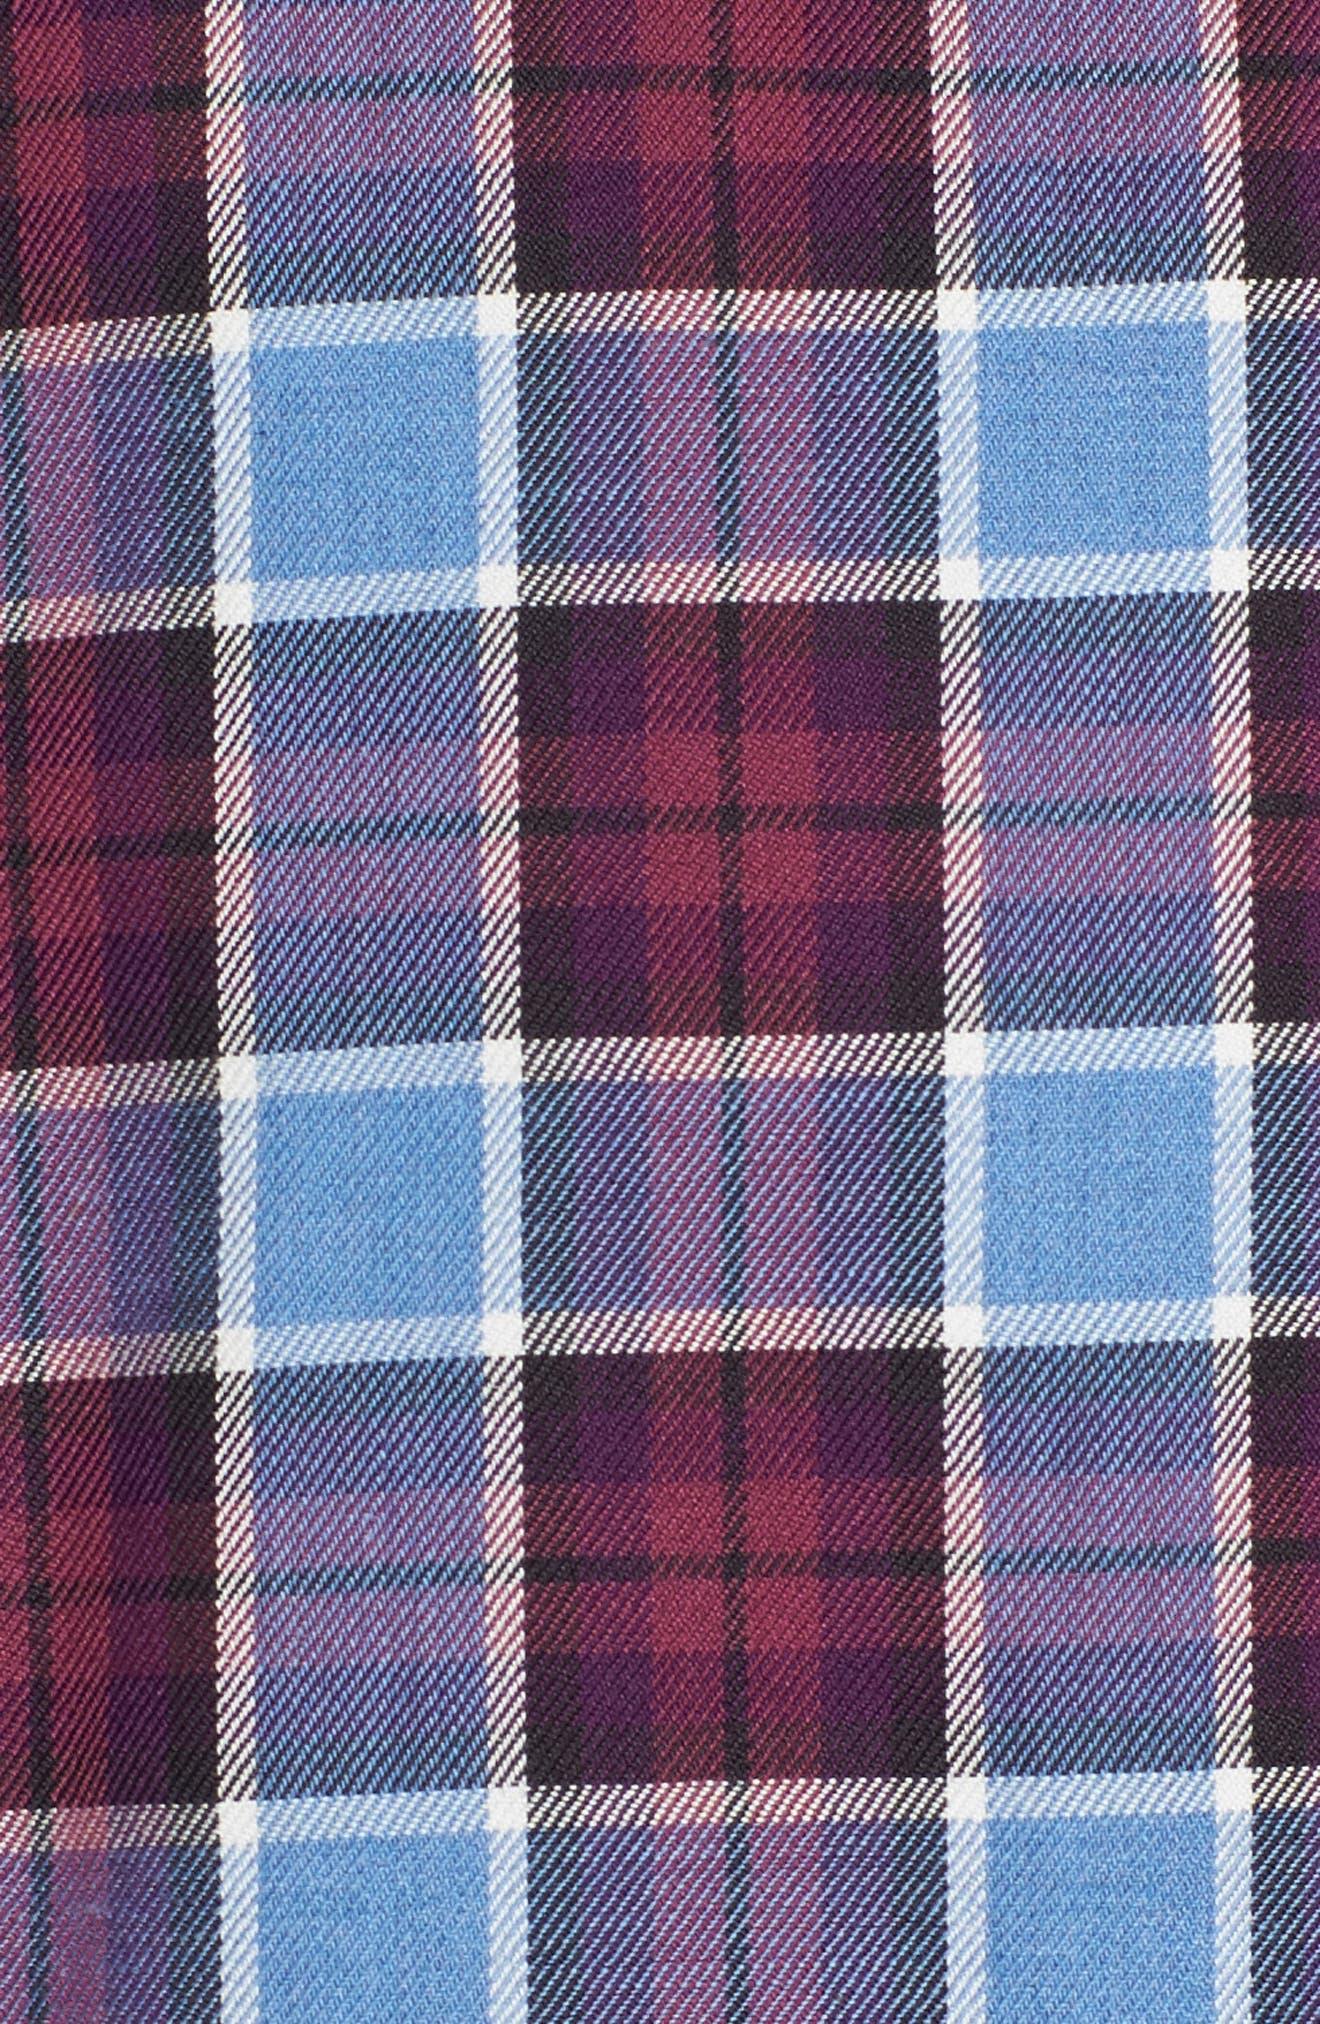 Chareton Check Twill Sport Shirt,                             Alternate thumbnail 5, color,                             400